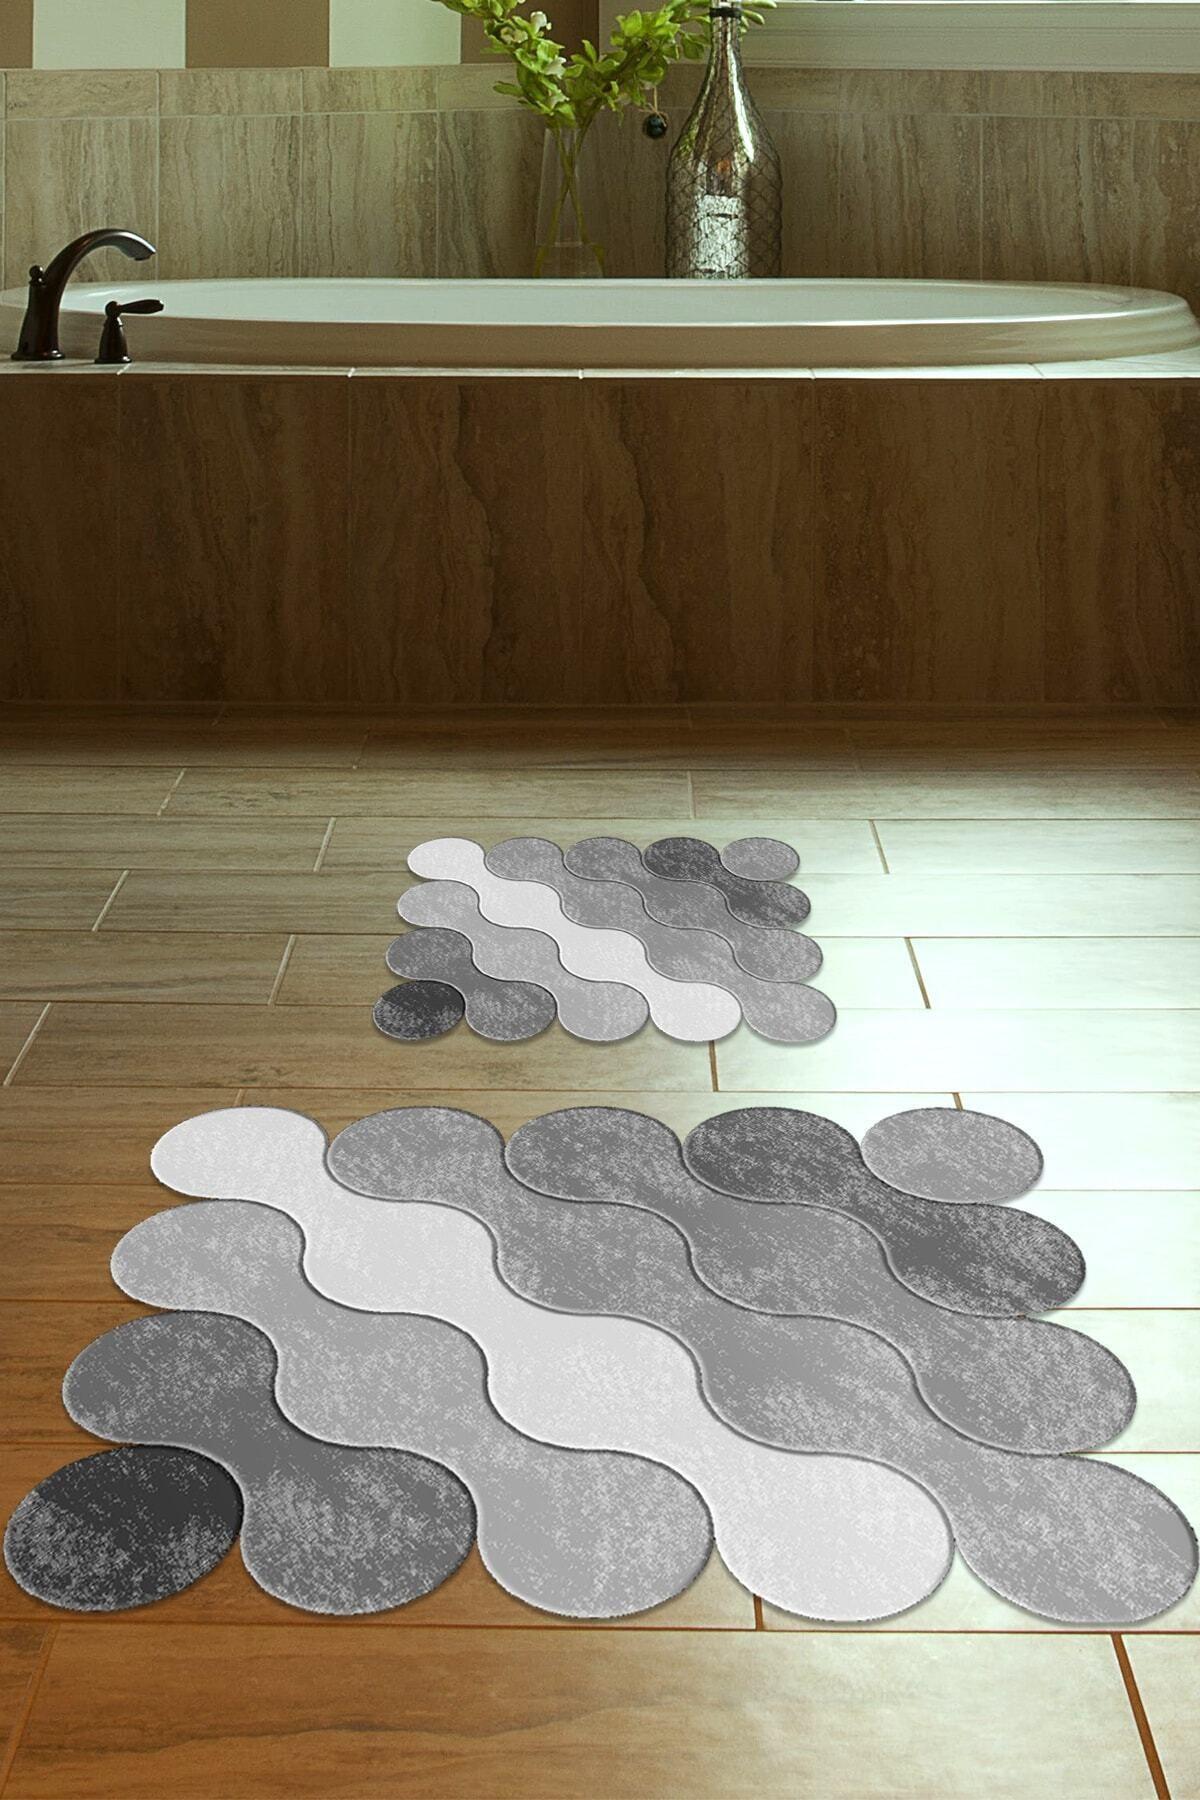 60x90 - 50x60 Grey Drop Dijital Banyo Paspası Lazer Kesim 2'li Klozet Takımı